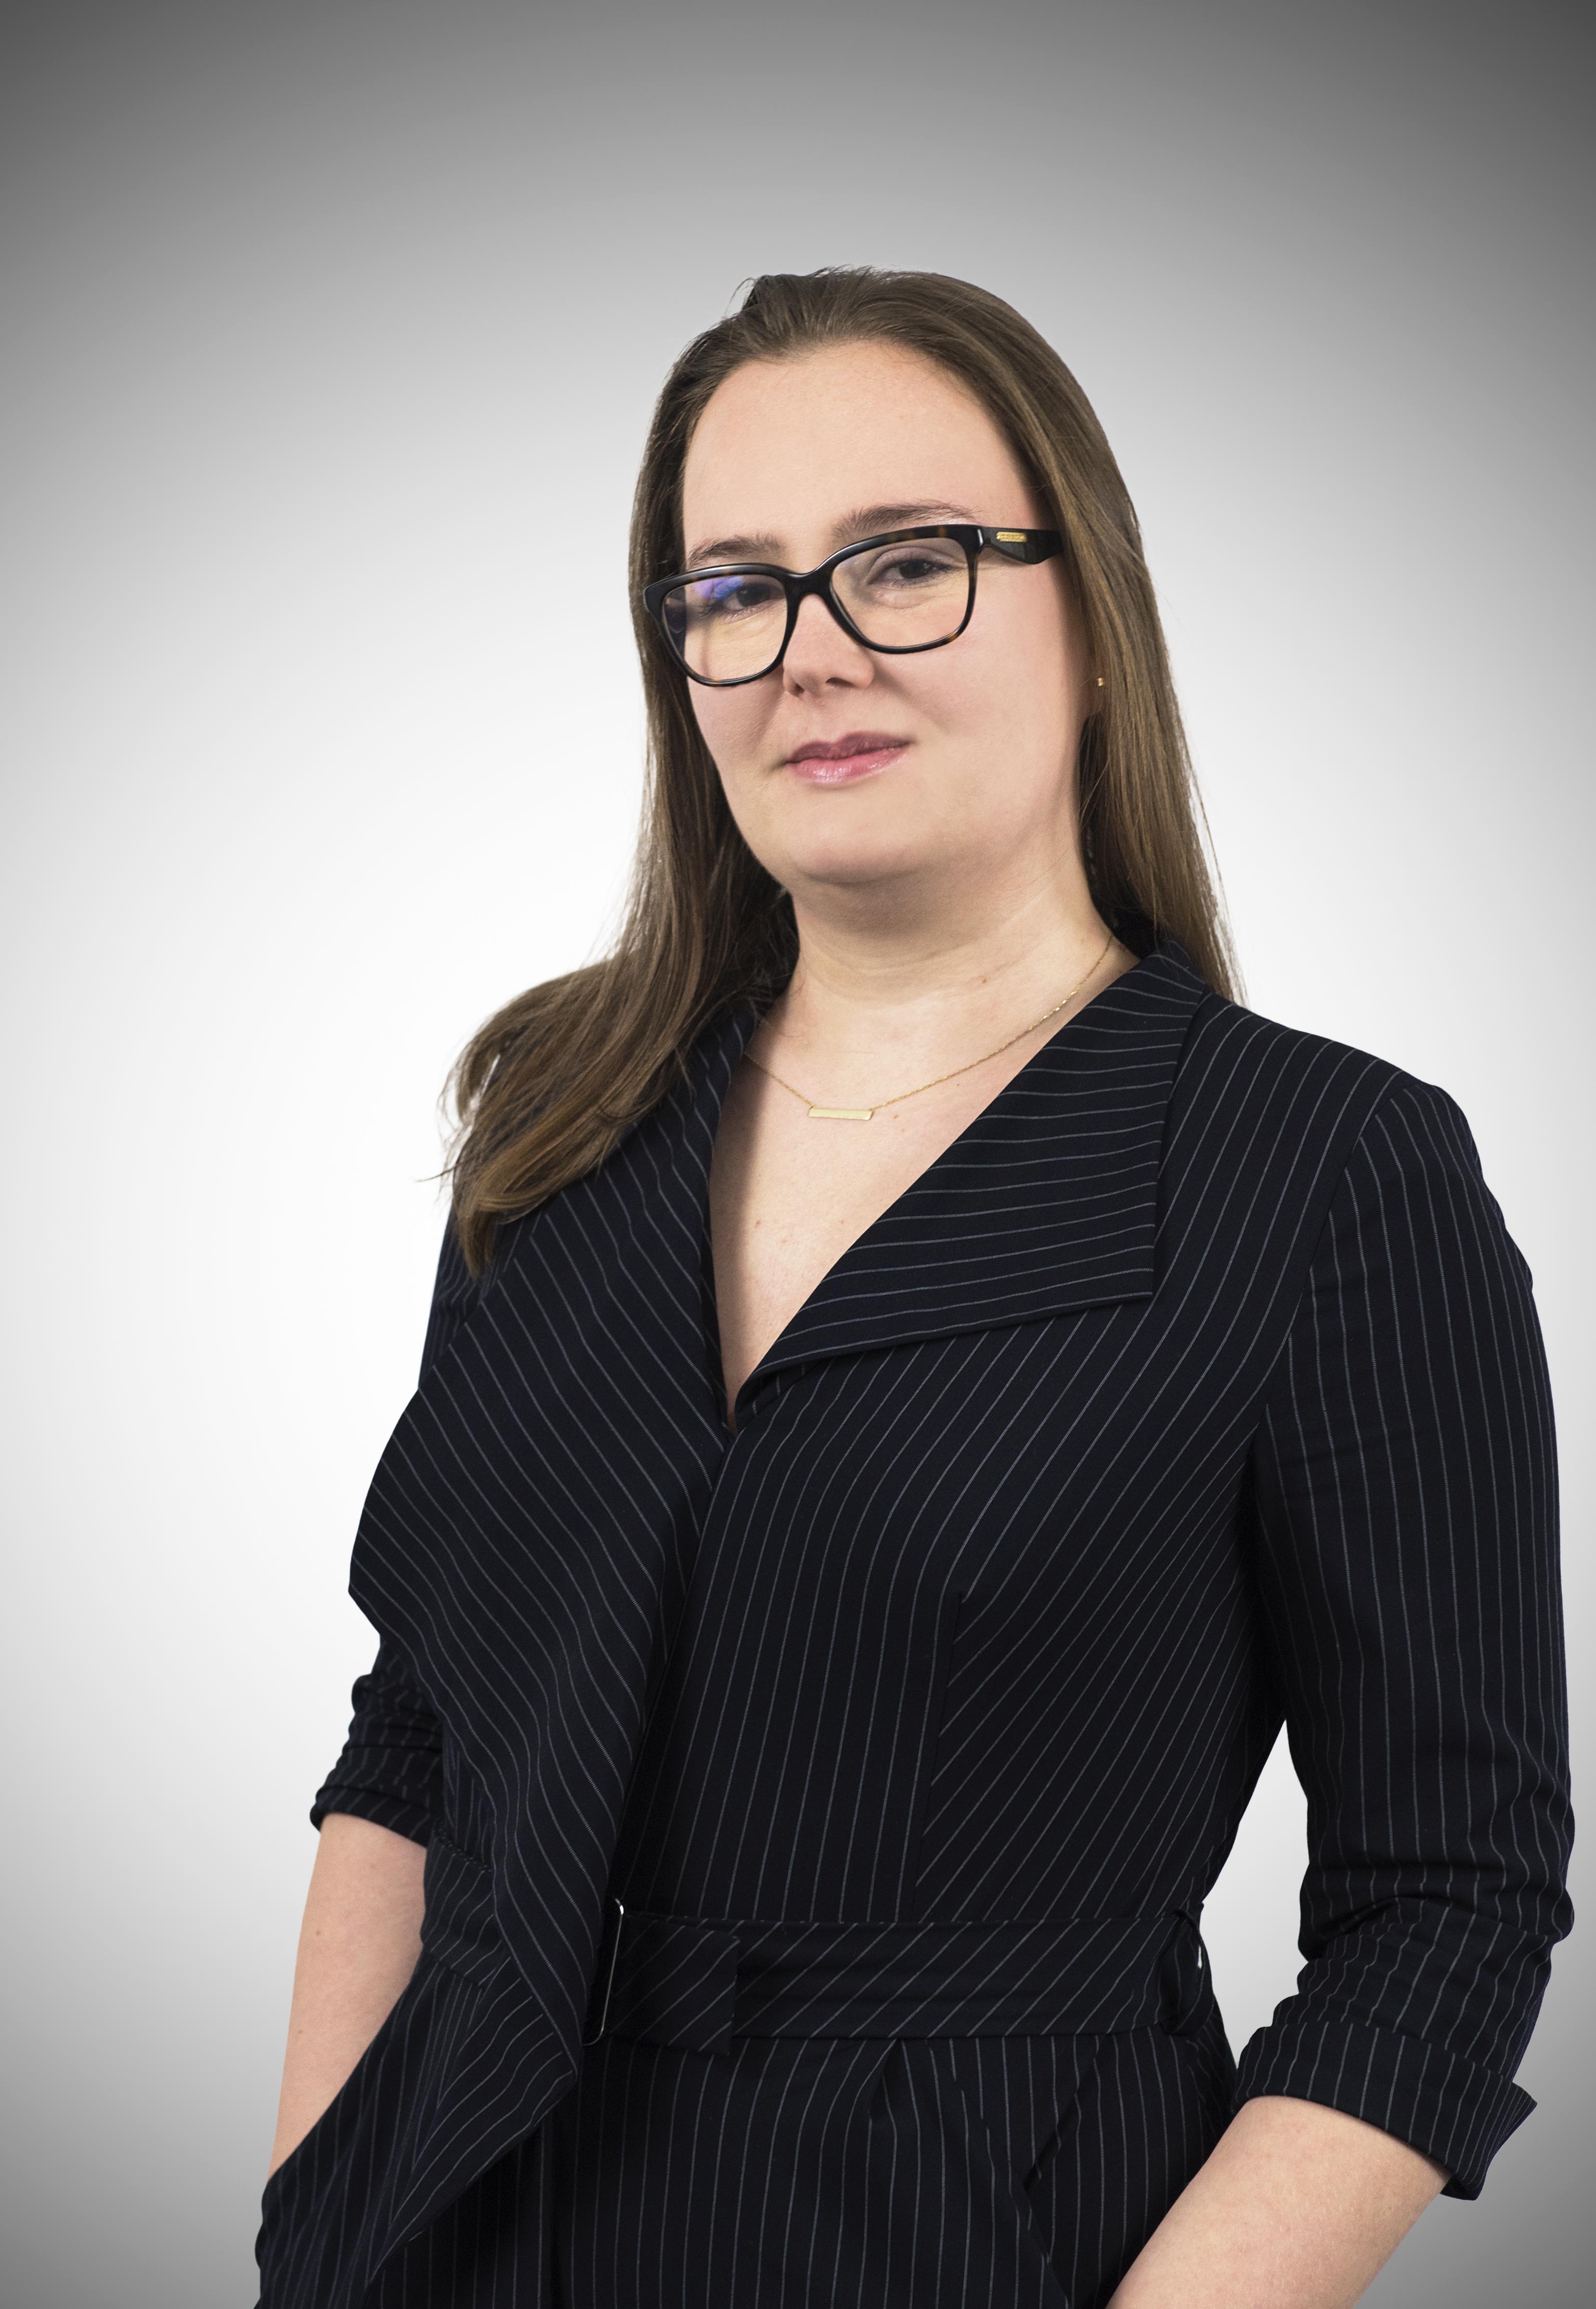 Joanna Bogdańska